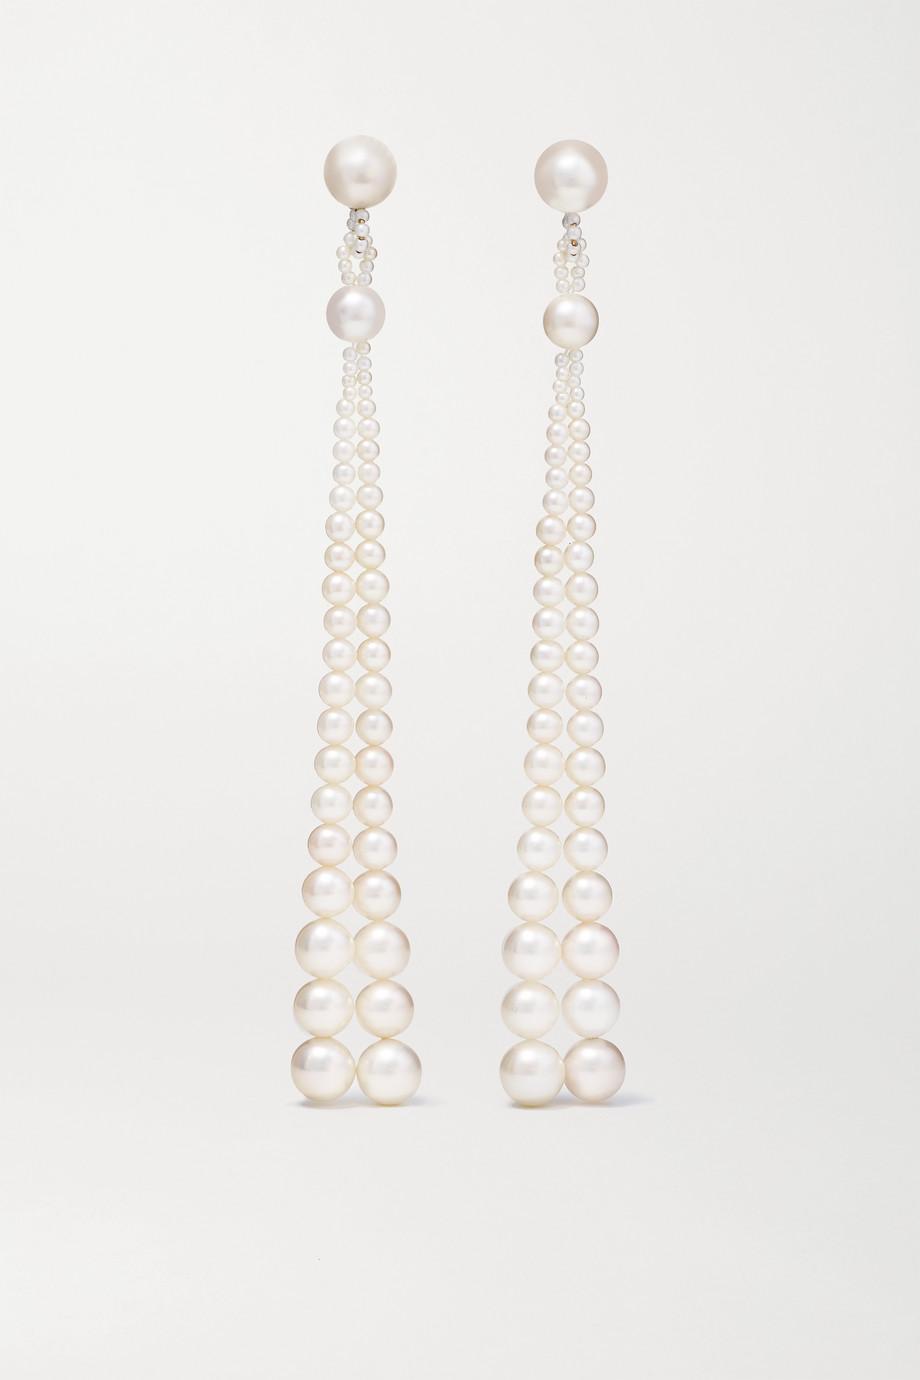 Sophie Bille Brahe Peggy Opera 14-karat gold pearl earrings